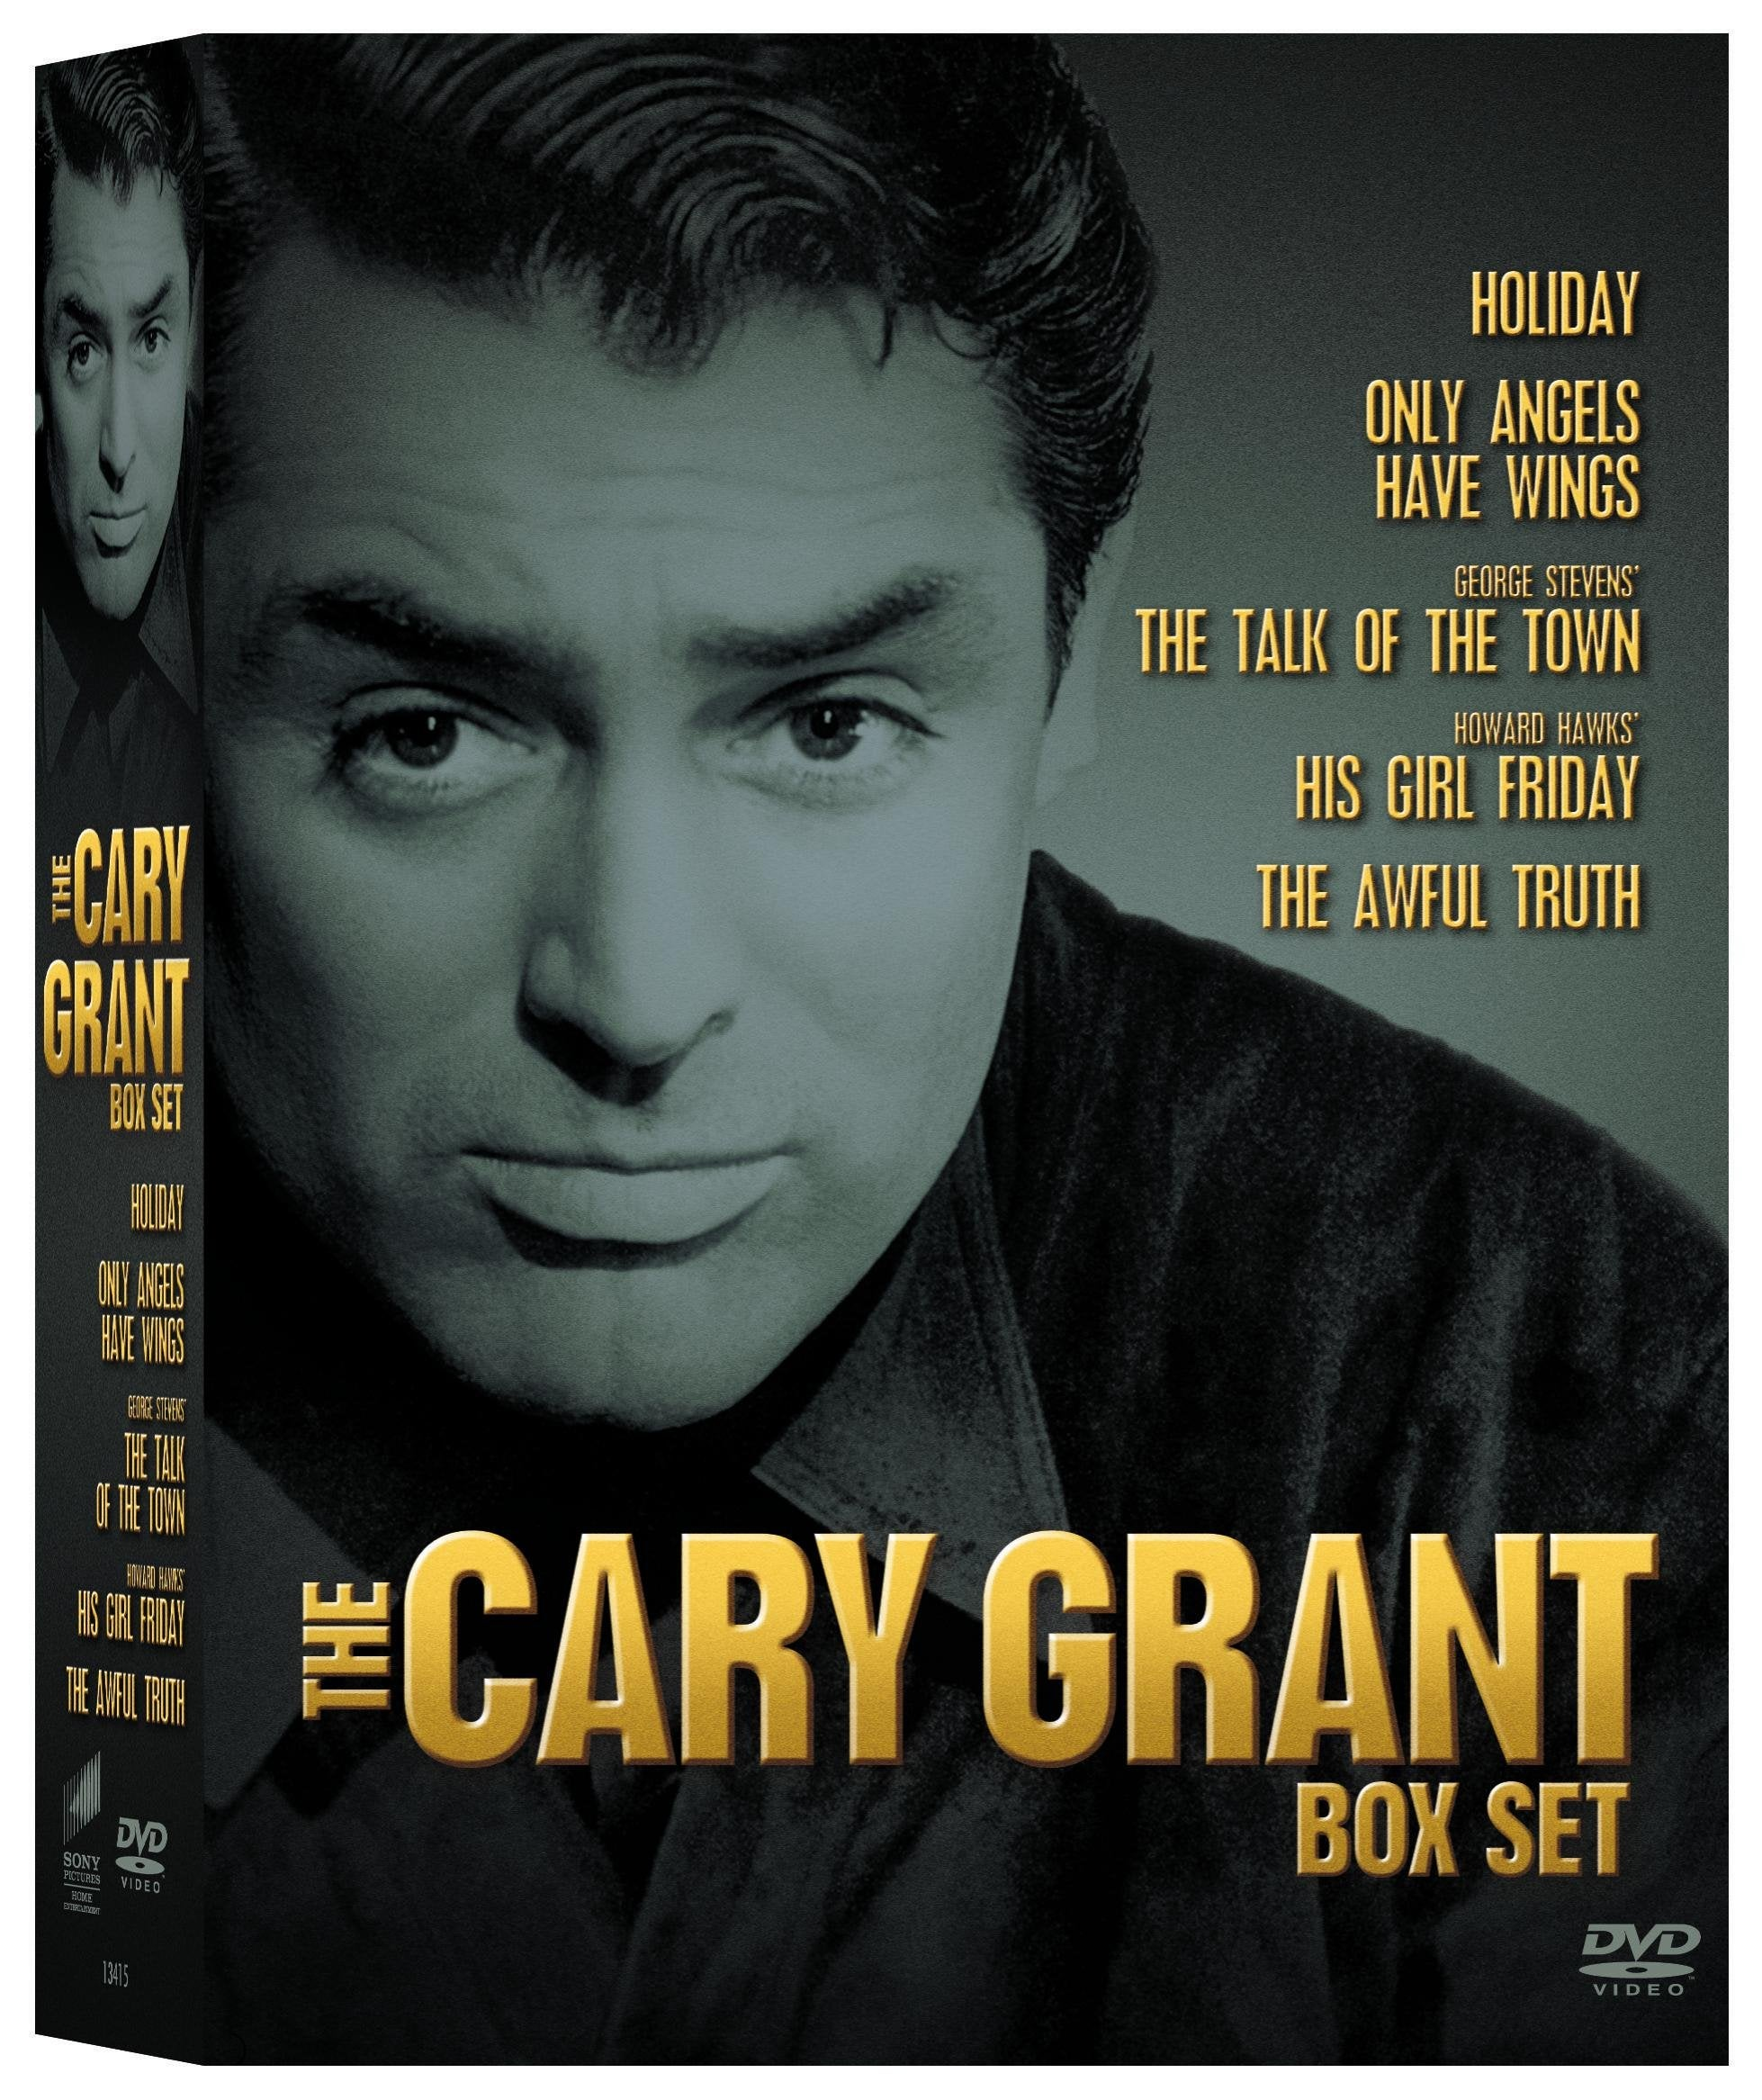 Cary Grant Box Set (DVD)